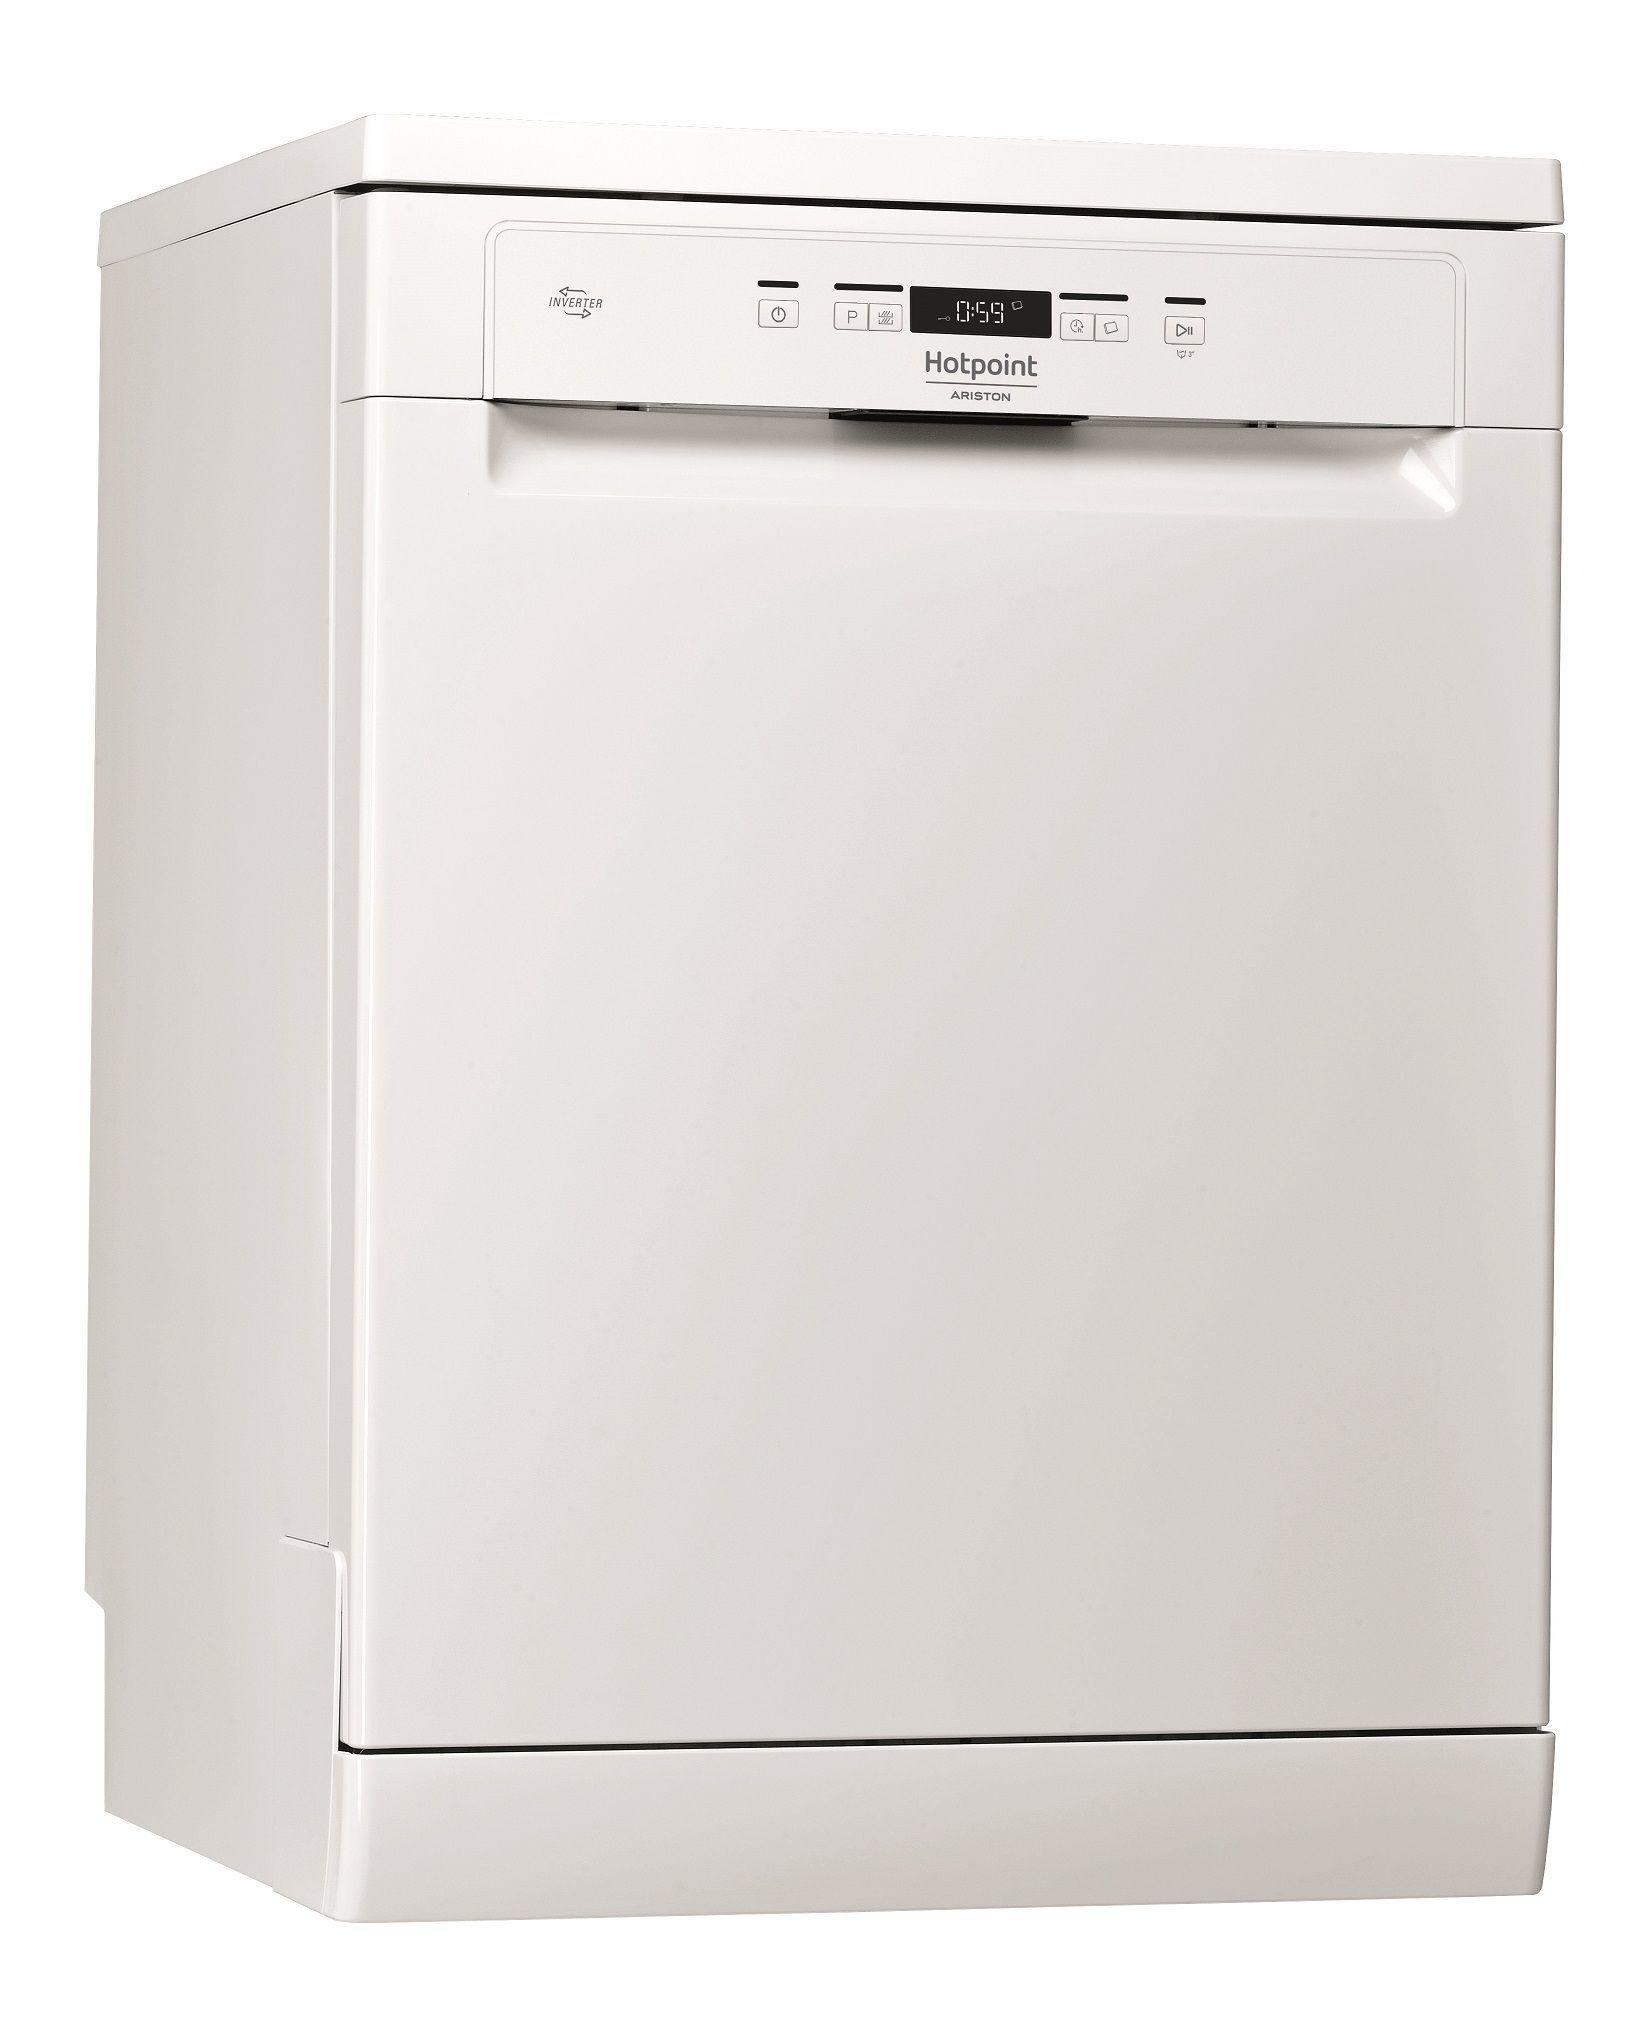 hotpoint lave vaisselle hfc 3b 26 blanc achat lave vaisselle a. Black Bedroom Furniture Sets. Home Design Ideas